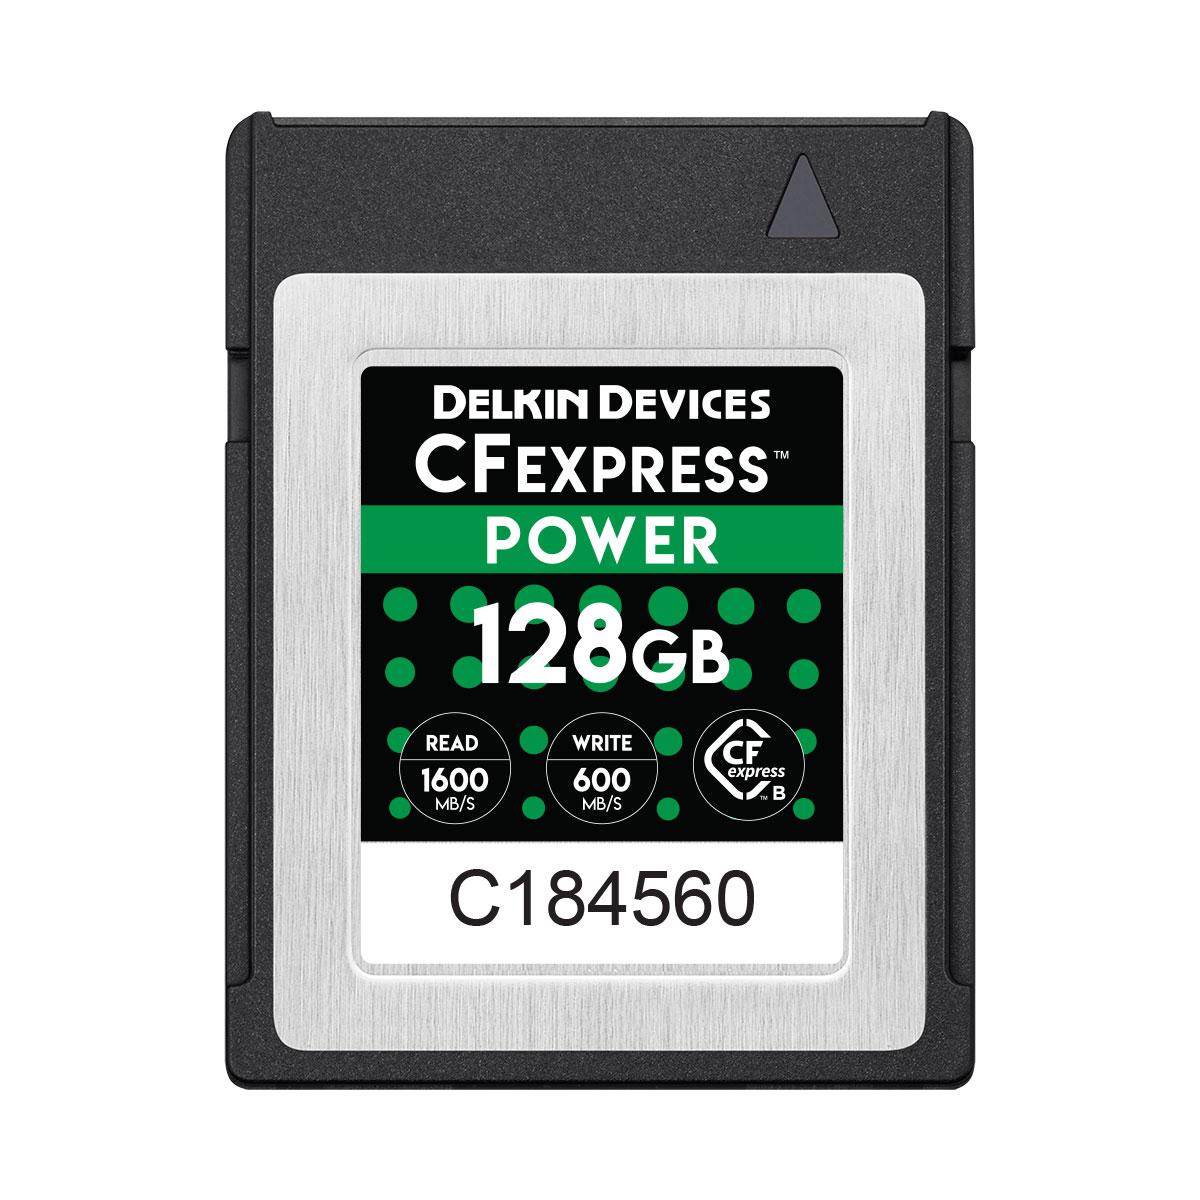 CFexpress POWER 126GB